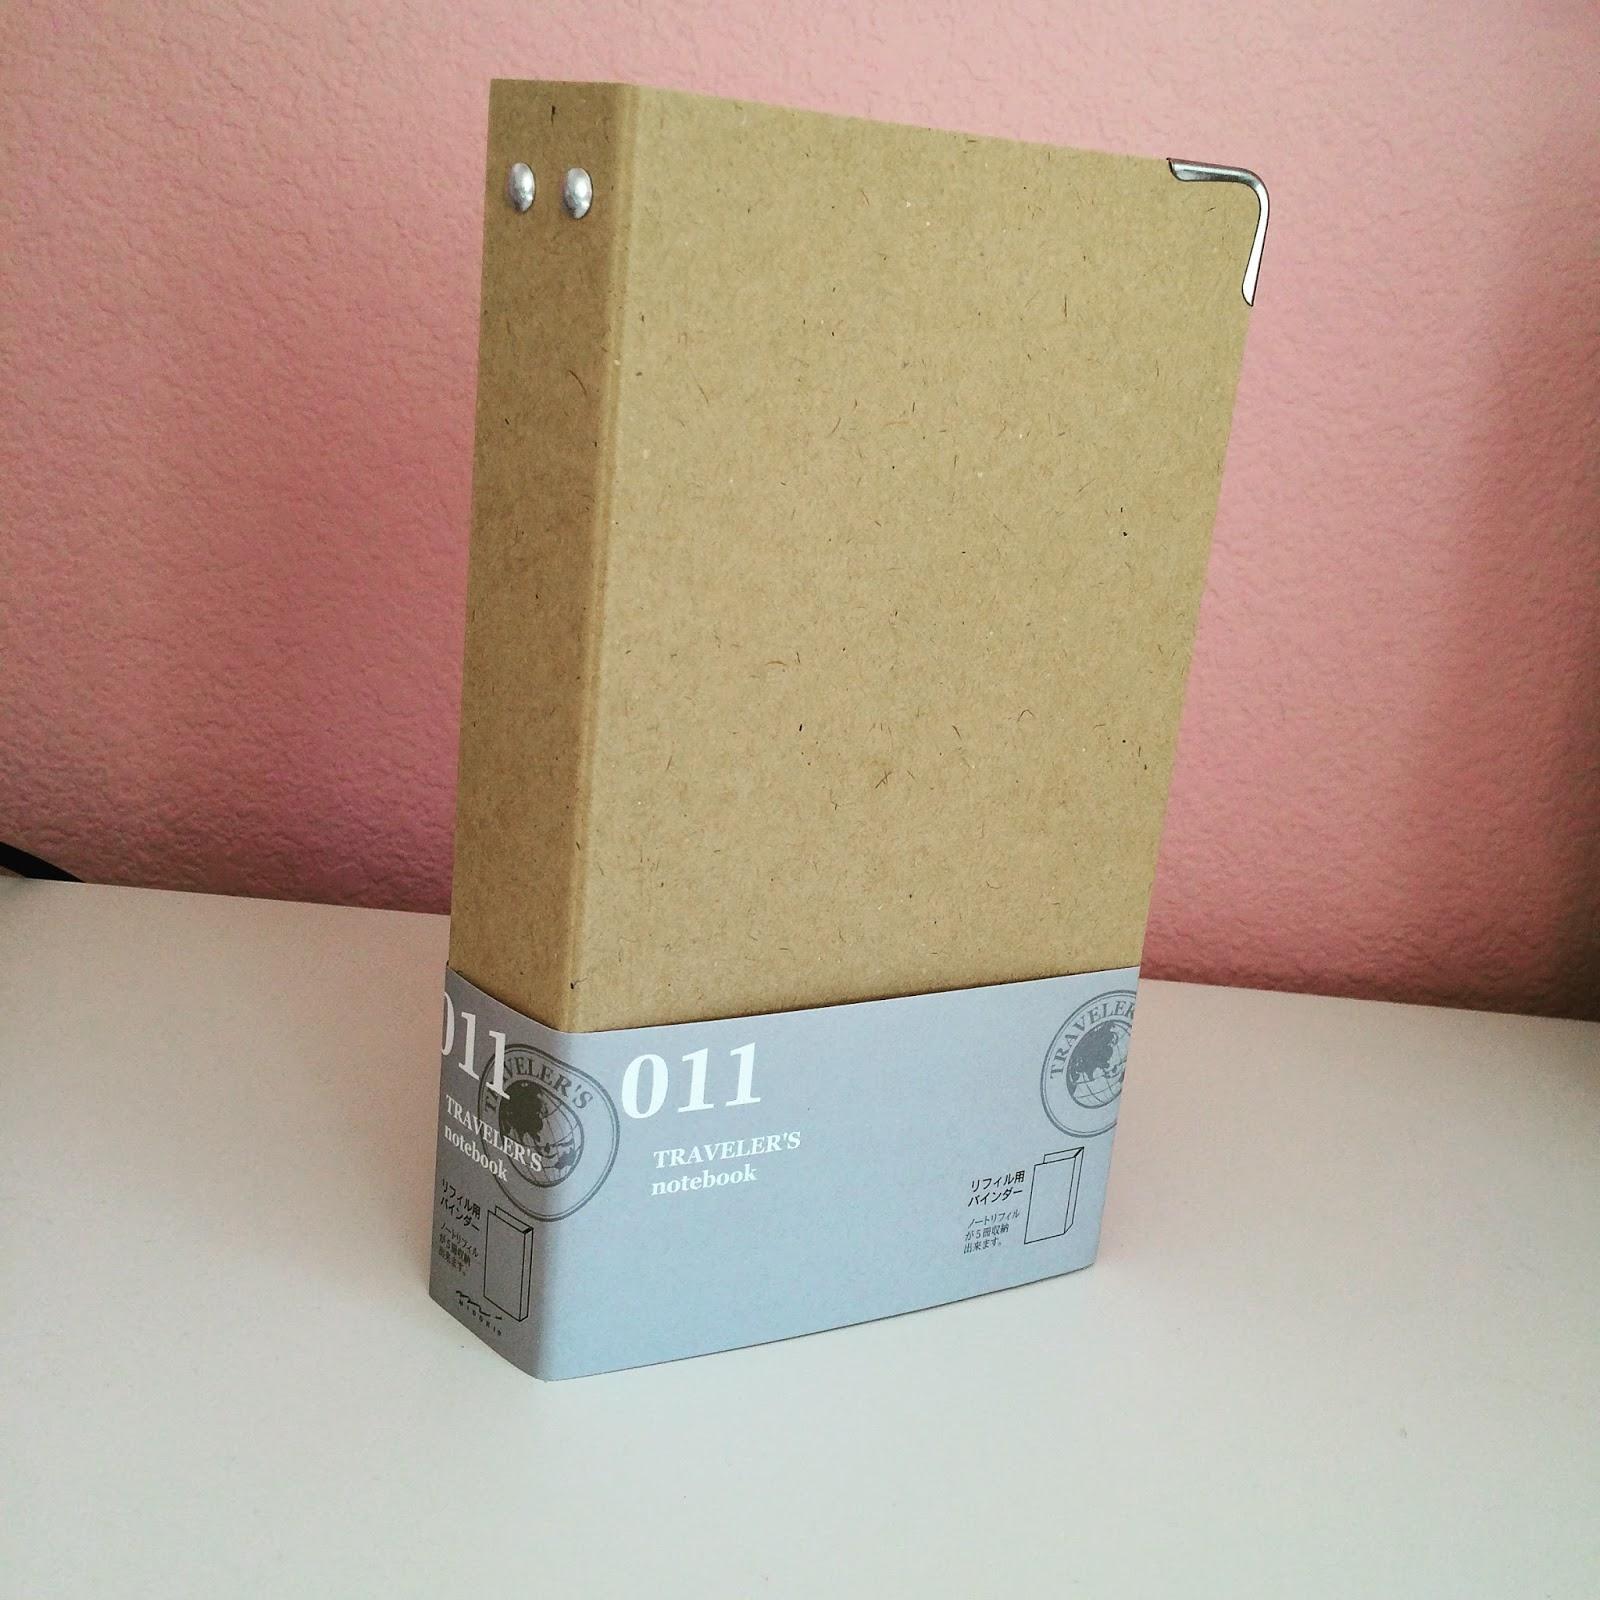 The Midori Traveleru0027s Notebook 011 Standard Storage Binder... finally decided to get them as my booklets began to pile up. Originally I didnu0027t think much ... & Juliau0027s Bento: Review : Midori Traveleru0027s Notebook 011 Standard ...